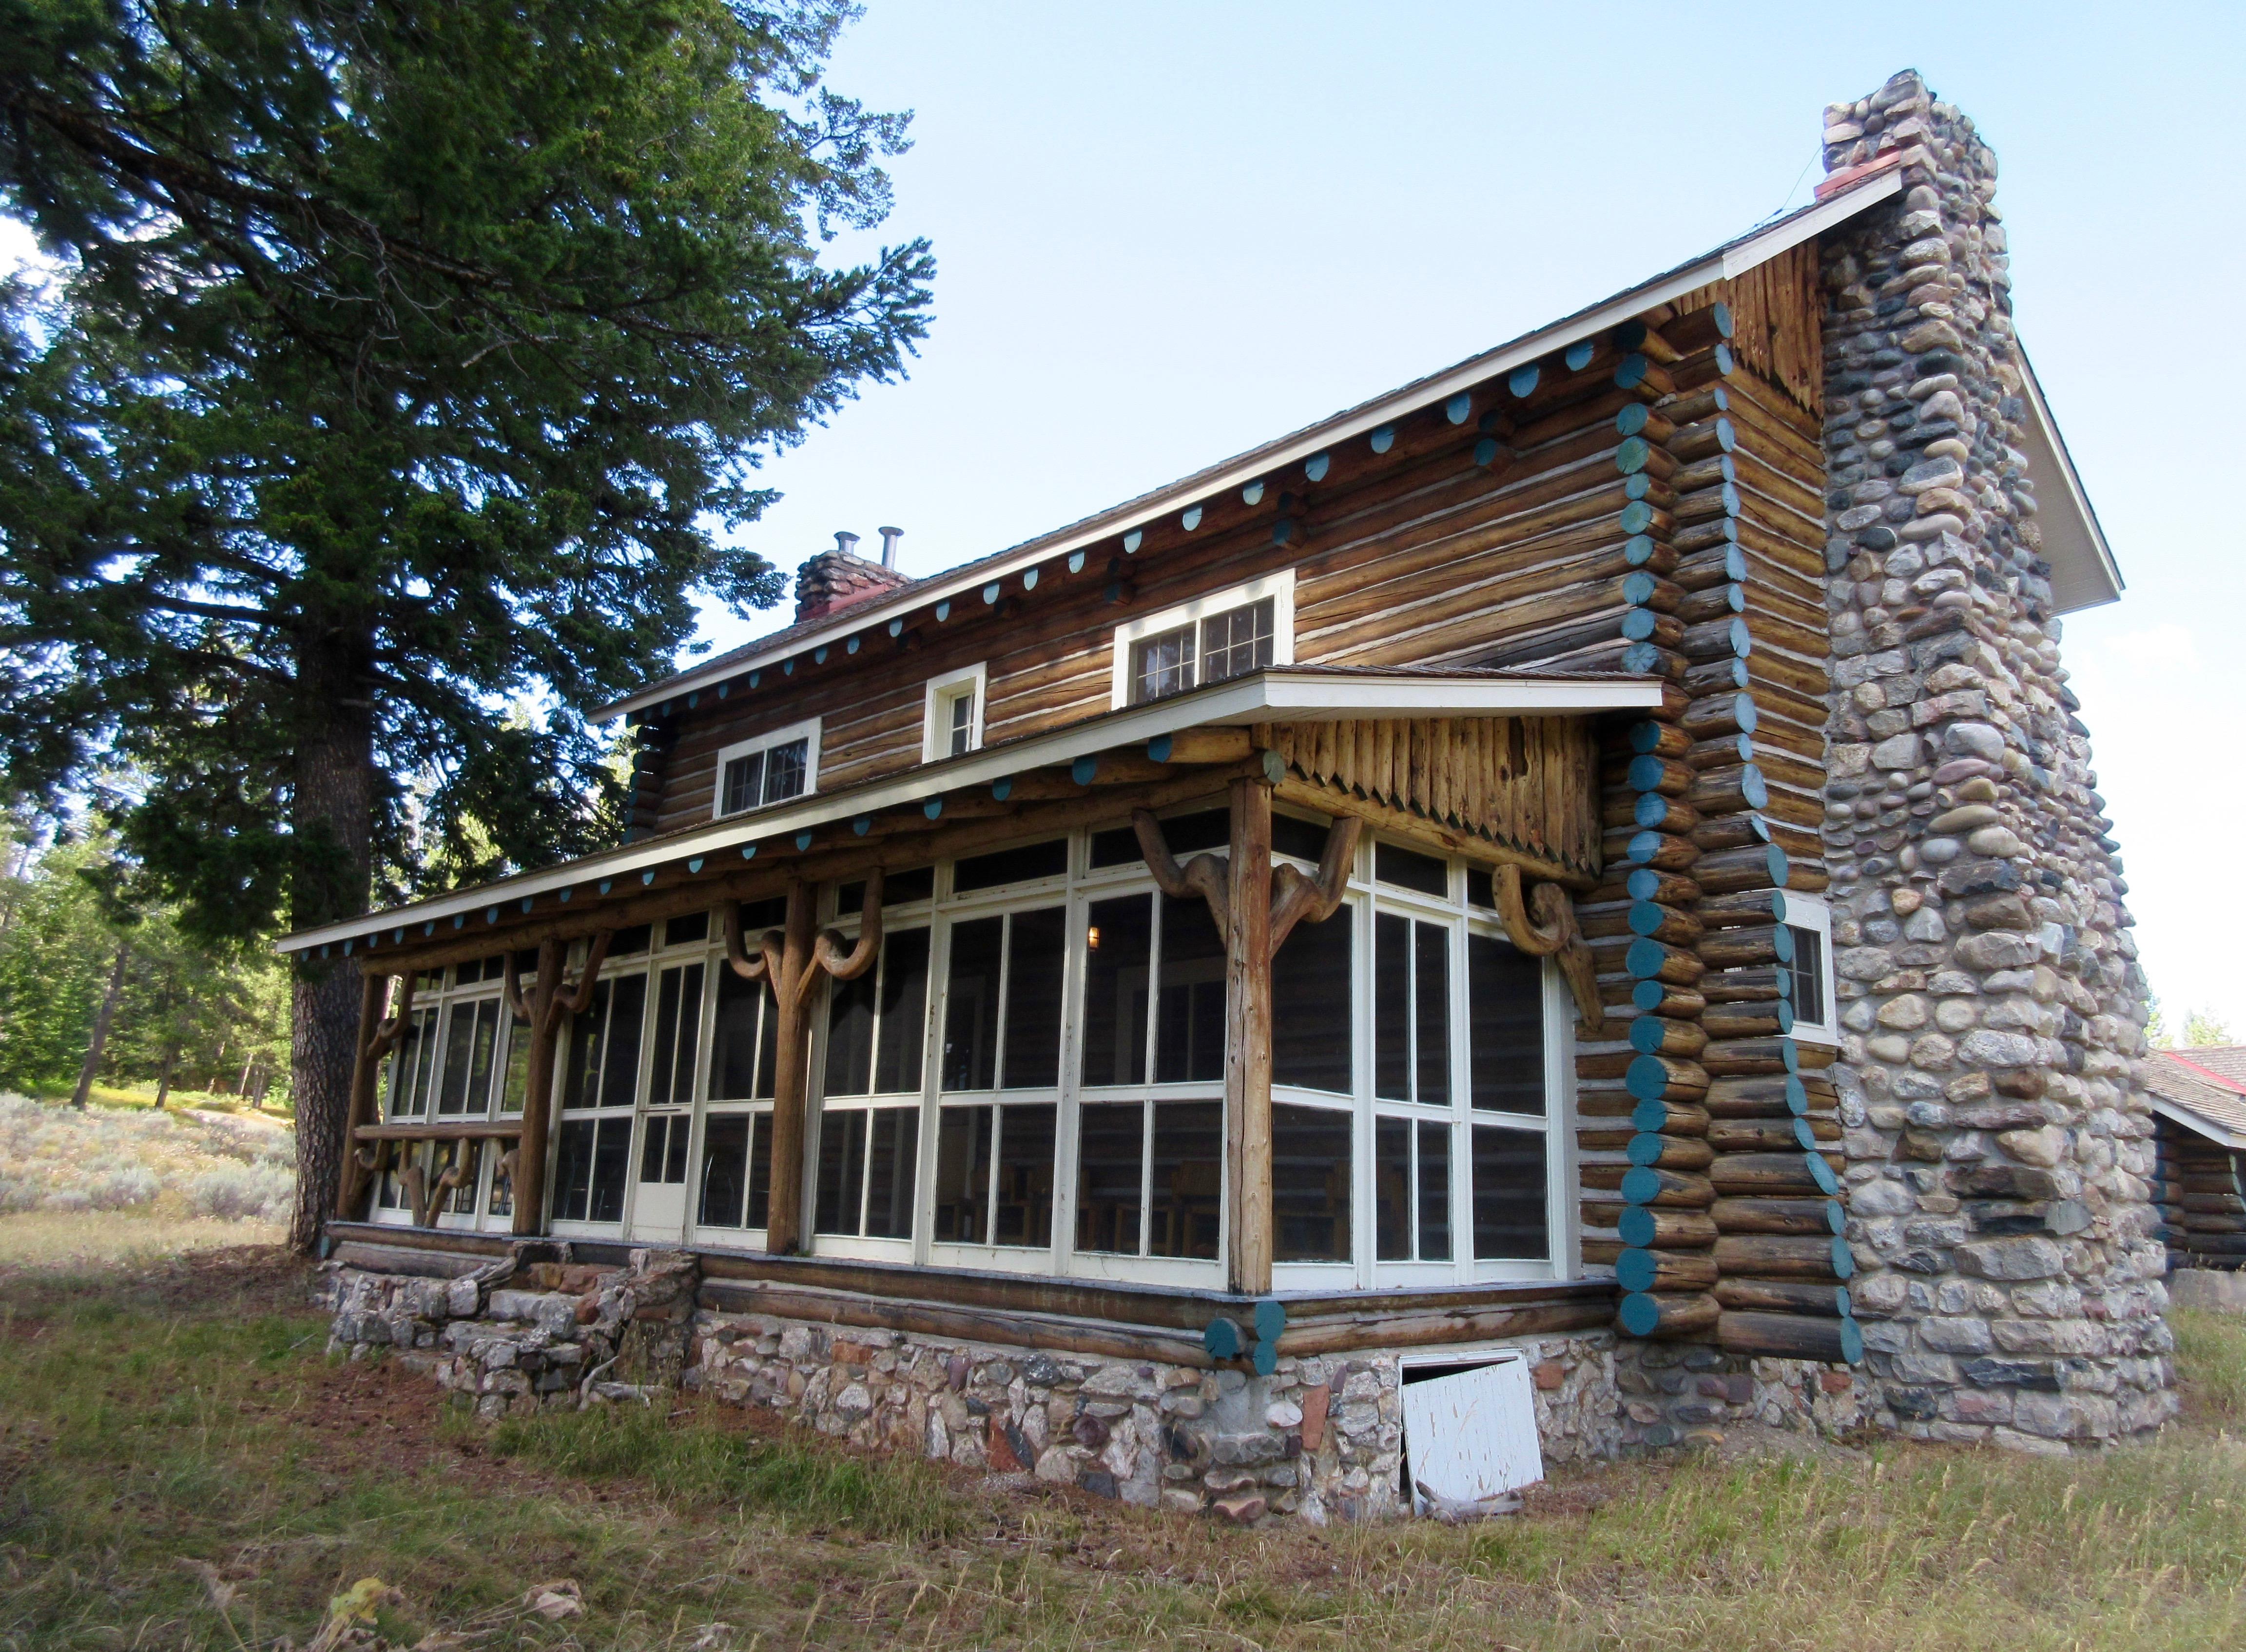 The Johnson Lodge